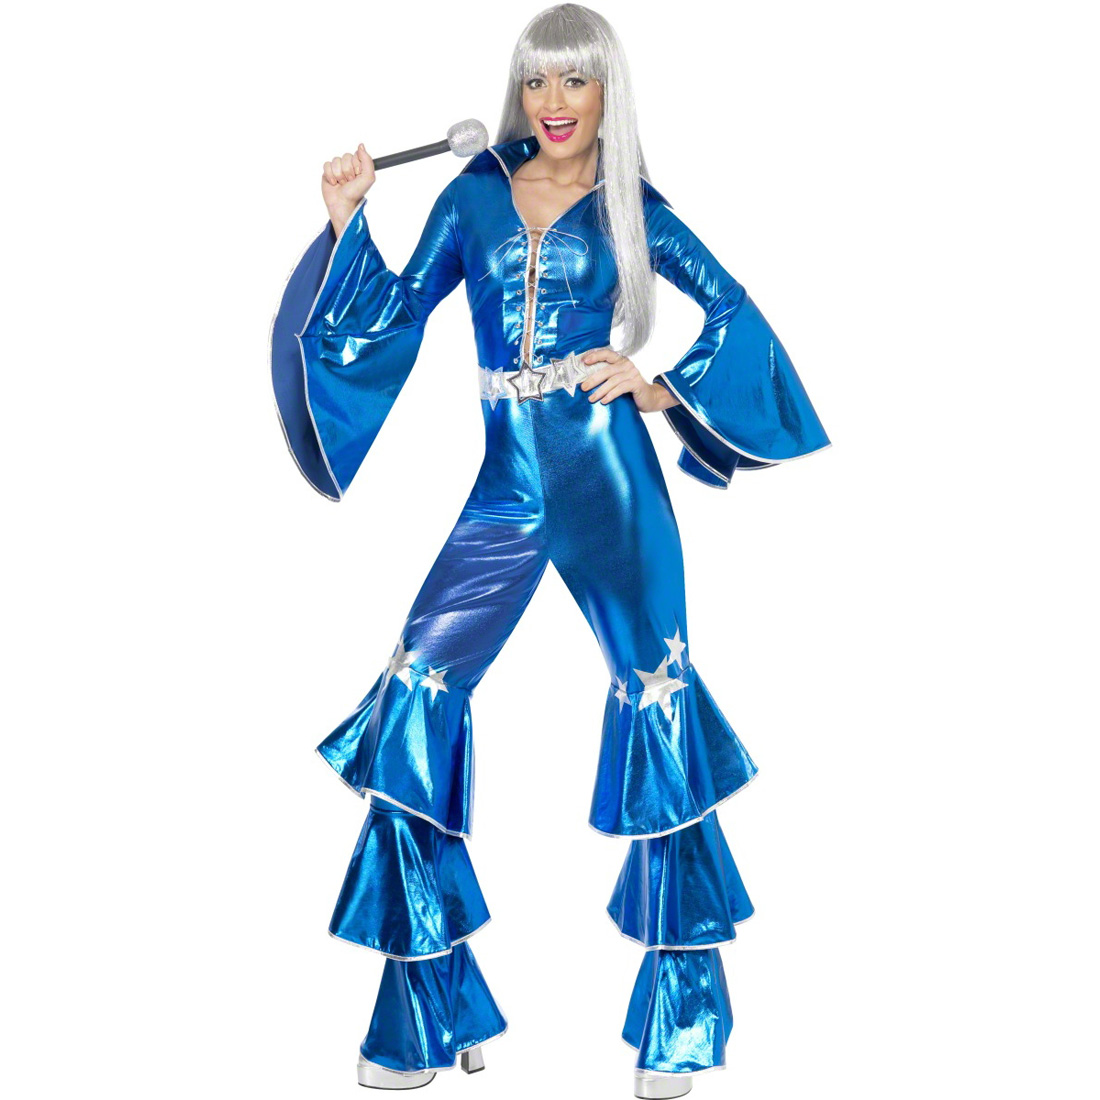 kost m damen 70er jahre outfit blau tanz overall schlager damenkost m tanzkost m ebay. Black Bedroom Furniture Sets. Home Design Ideas